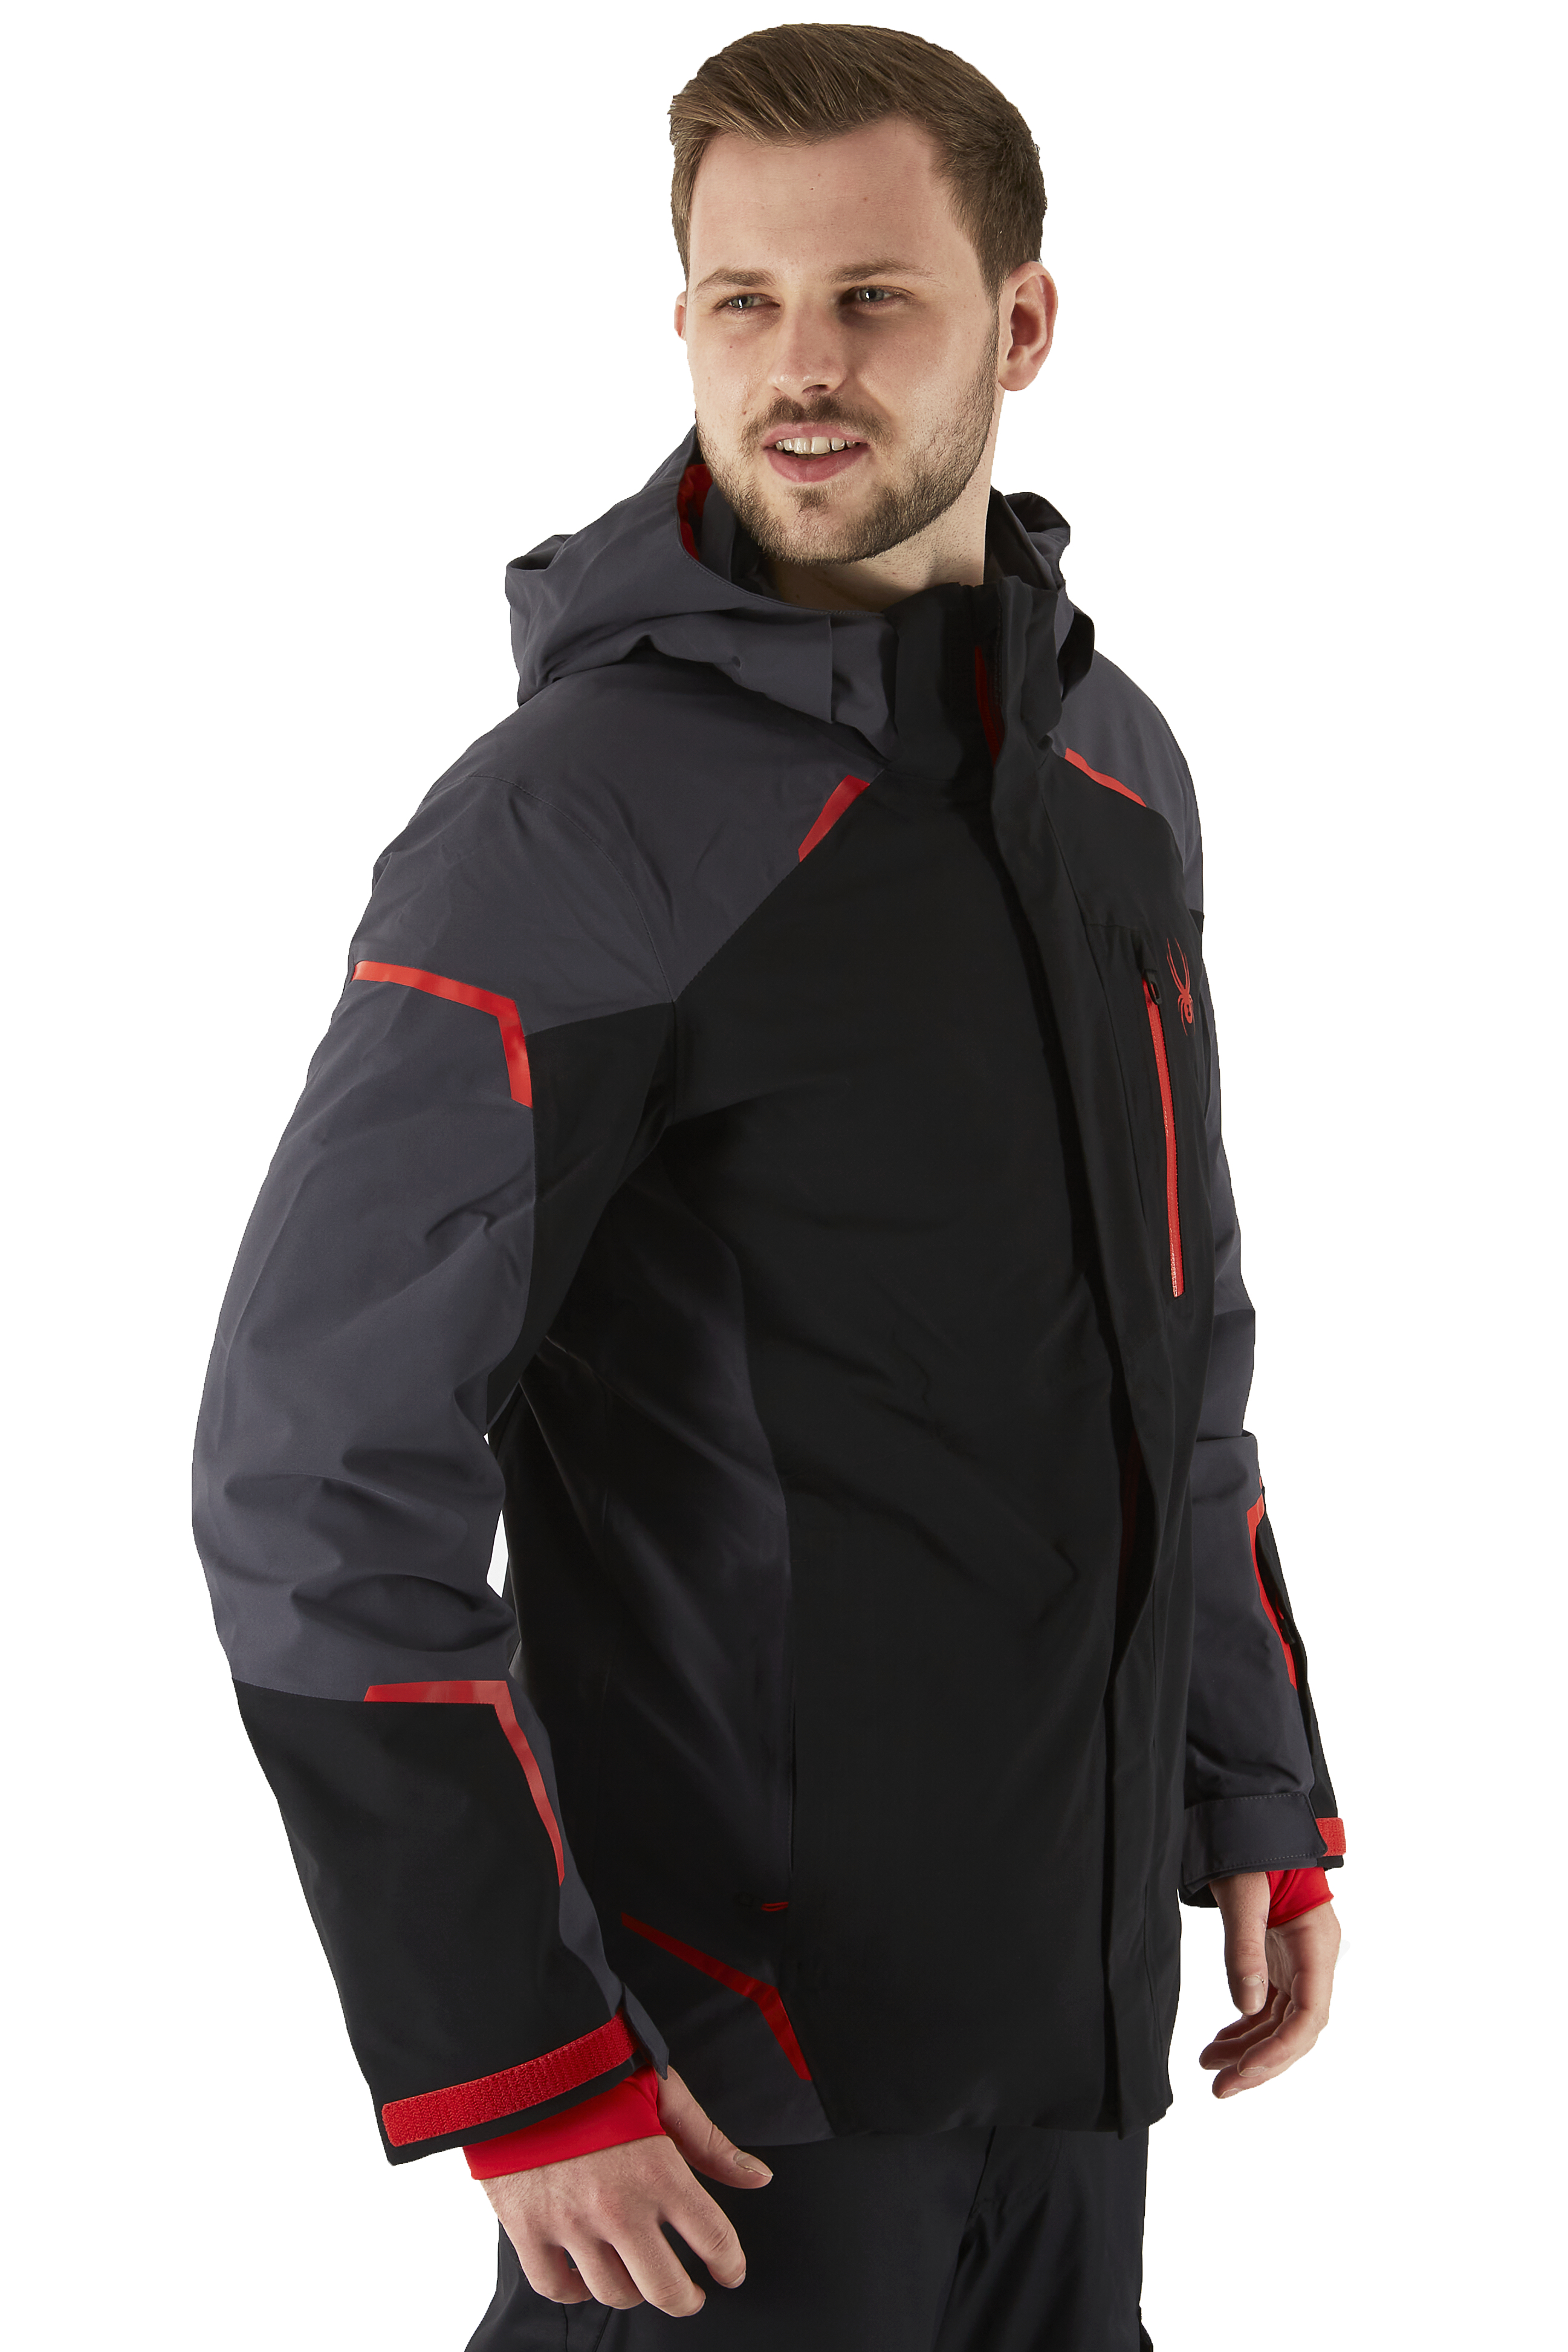 Spyder Copper Gore-Tex Ski/Snowboard Jacket, M Charcoal